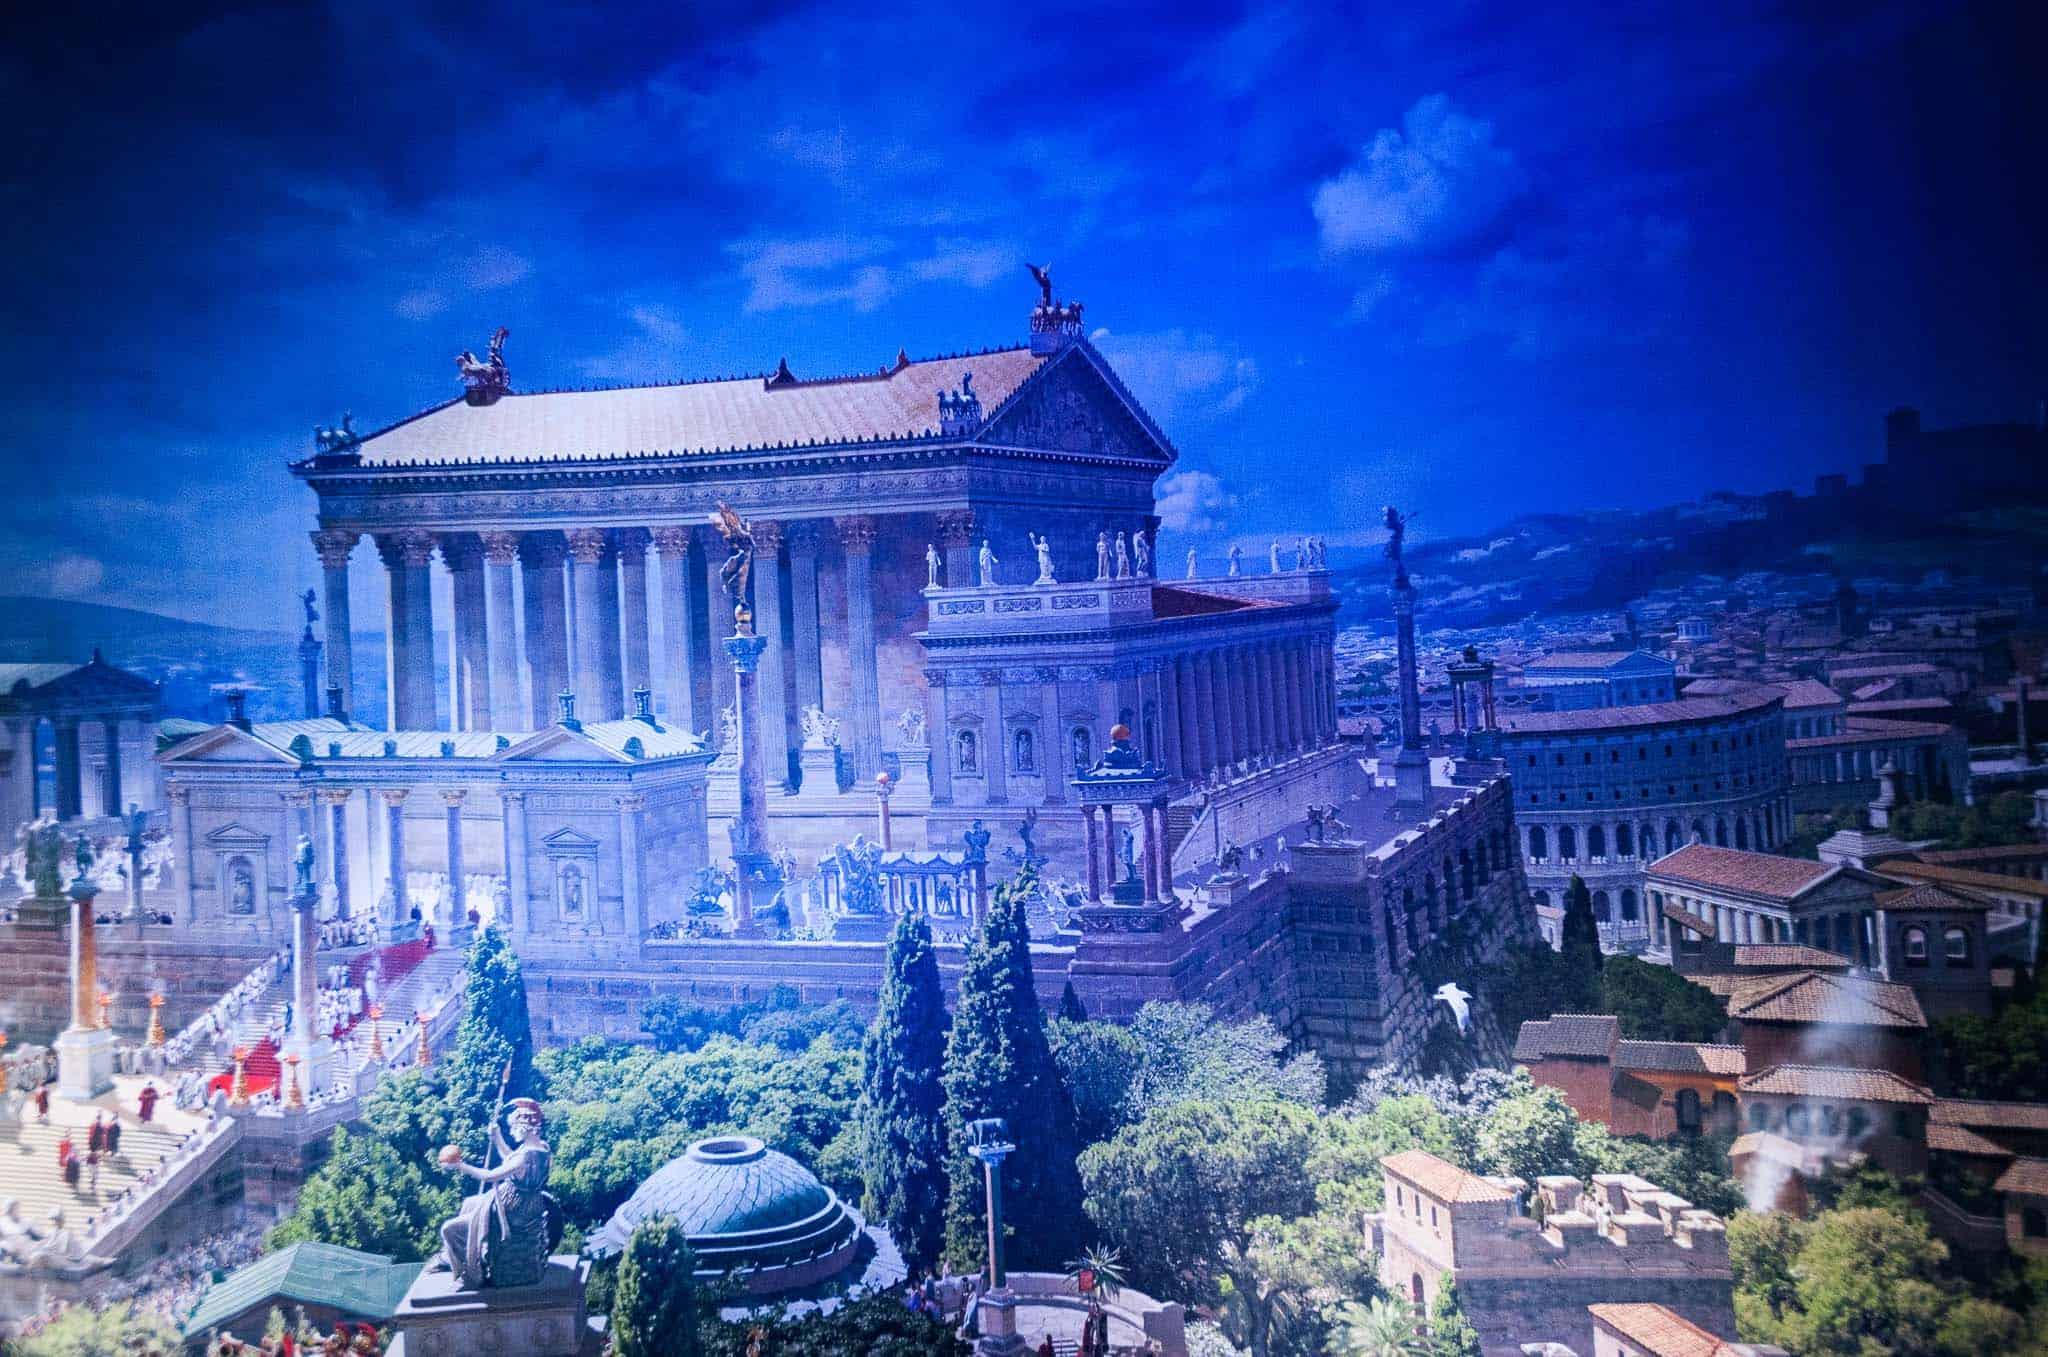 Yadegar Asisi, Römischer Tempel, 312 nach Christus